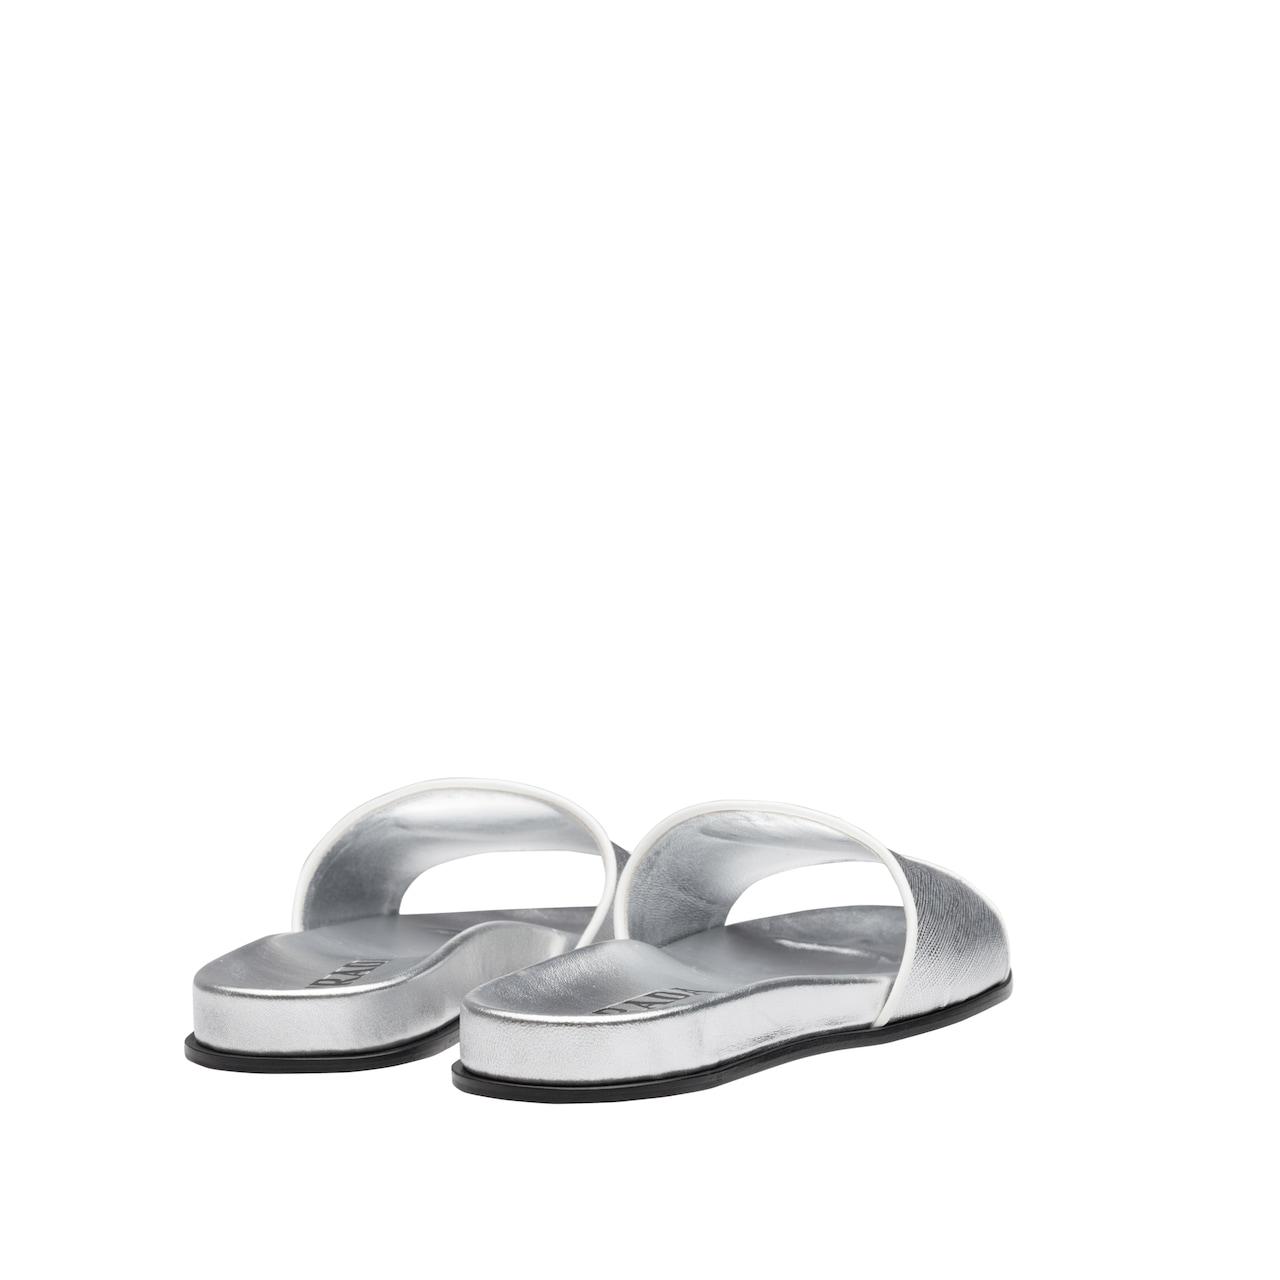 Sandales en cuir verni imprimé Saffiano